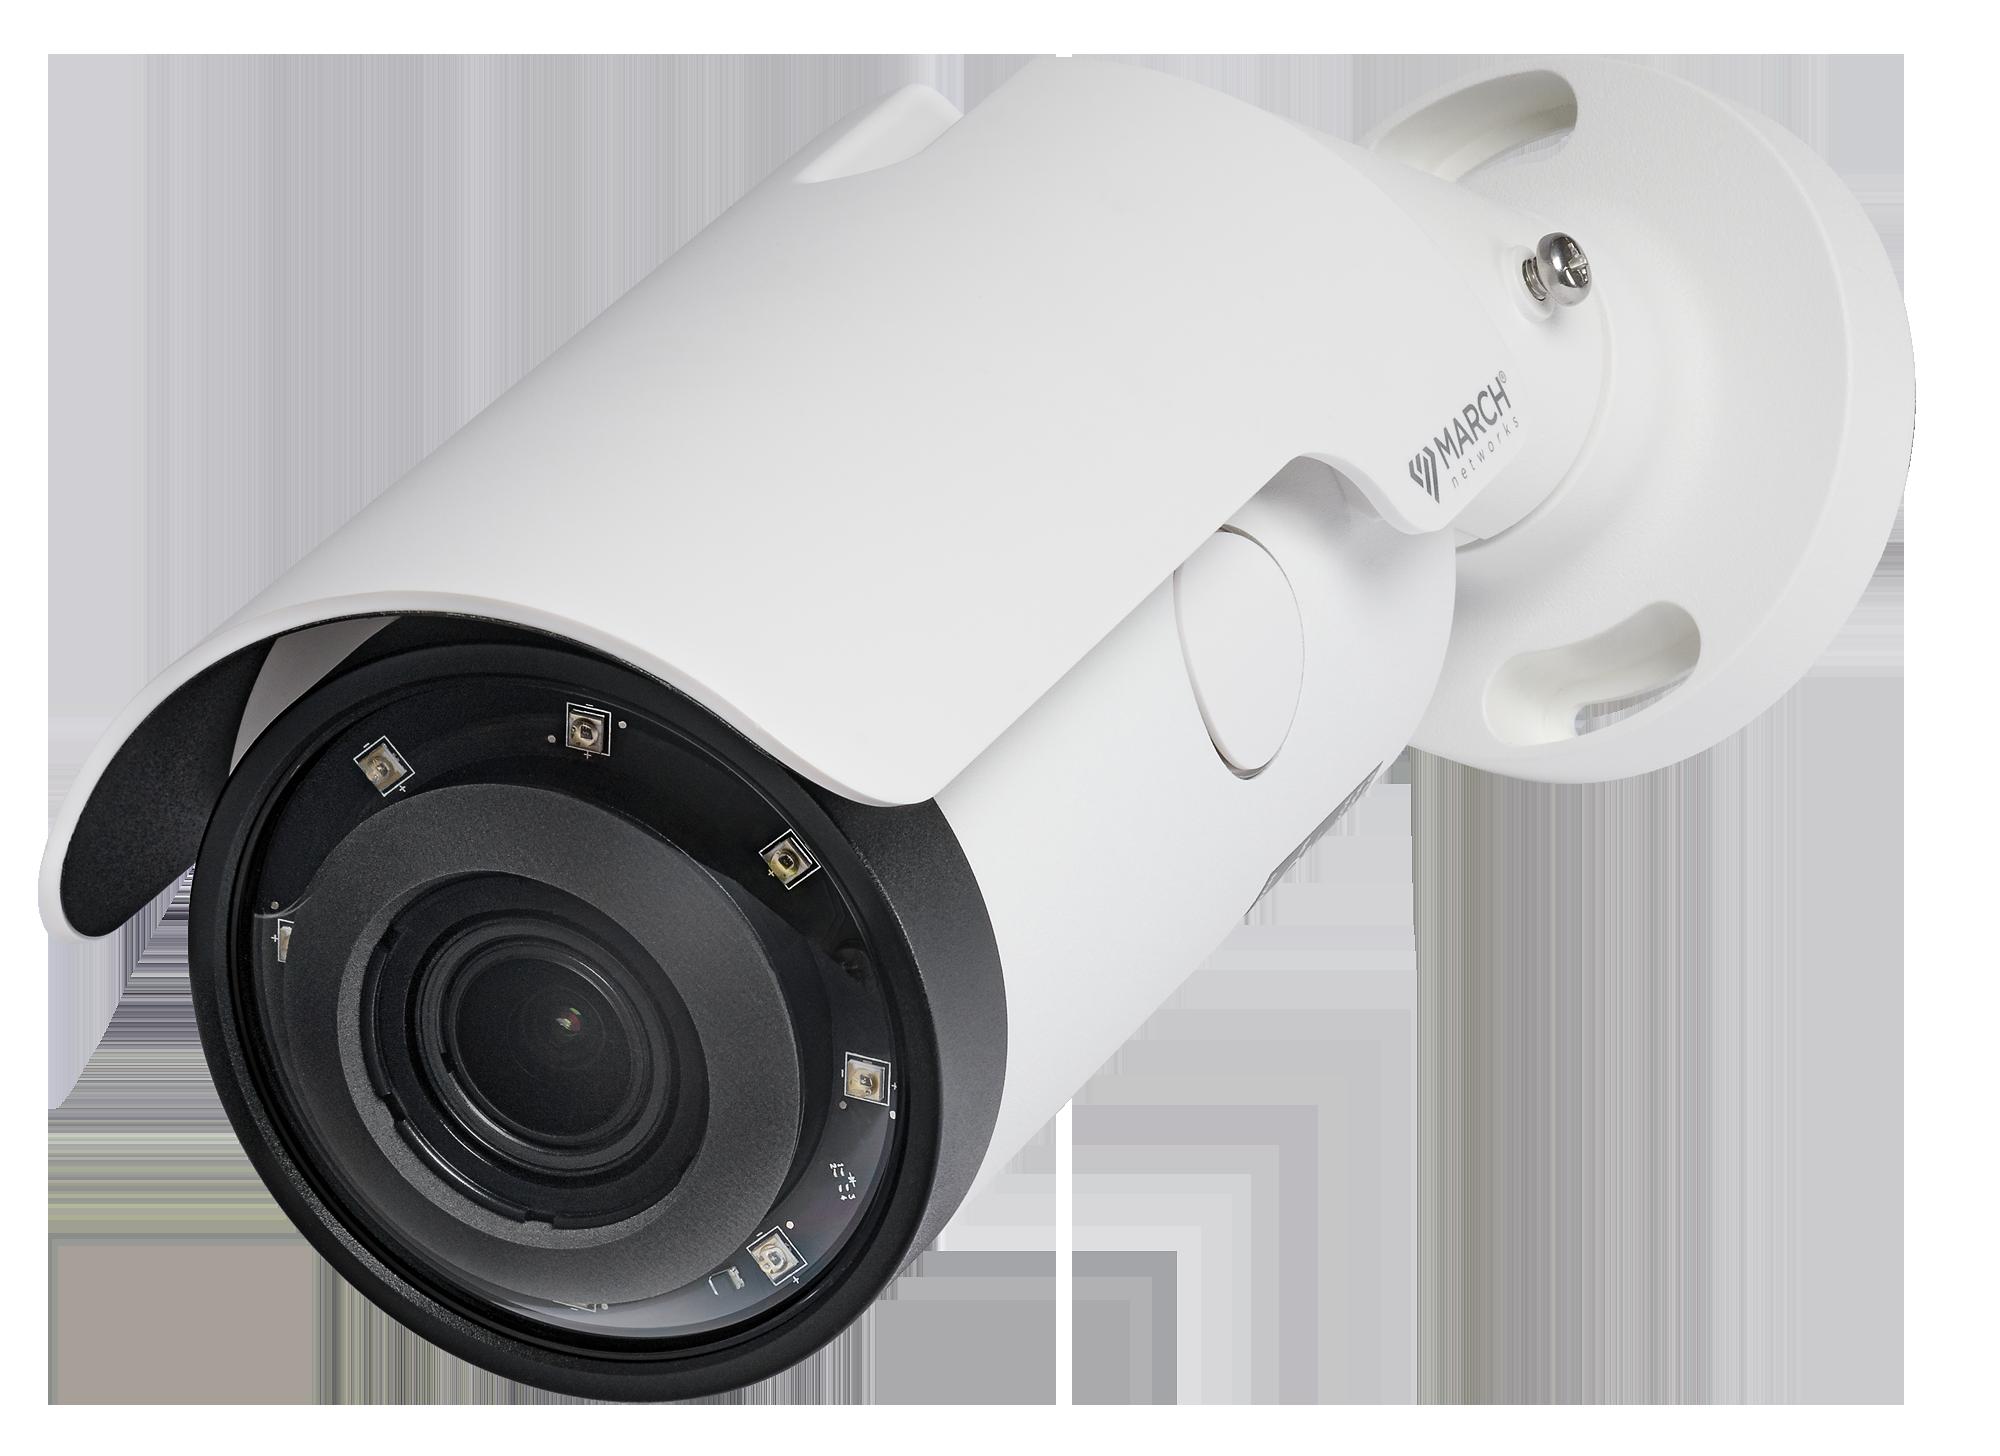 The SE4 IR DuraBullet security camera